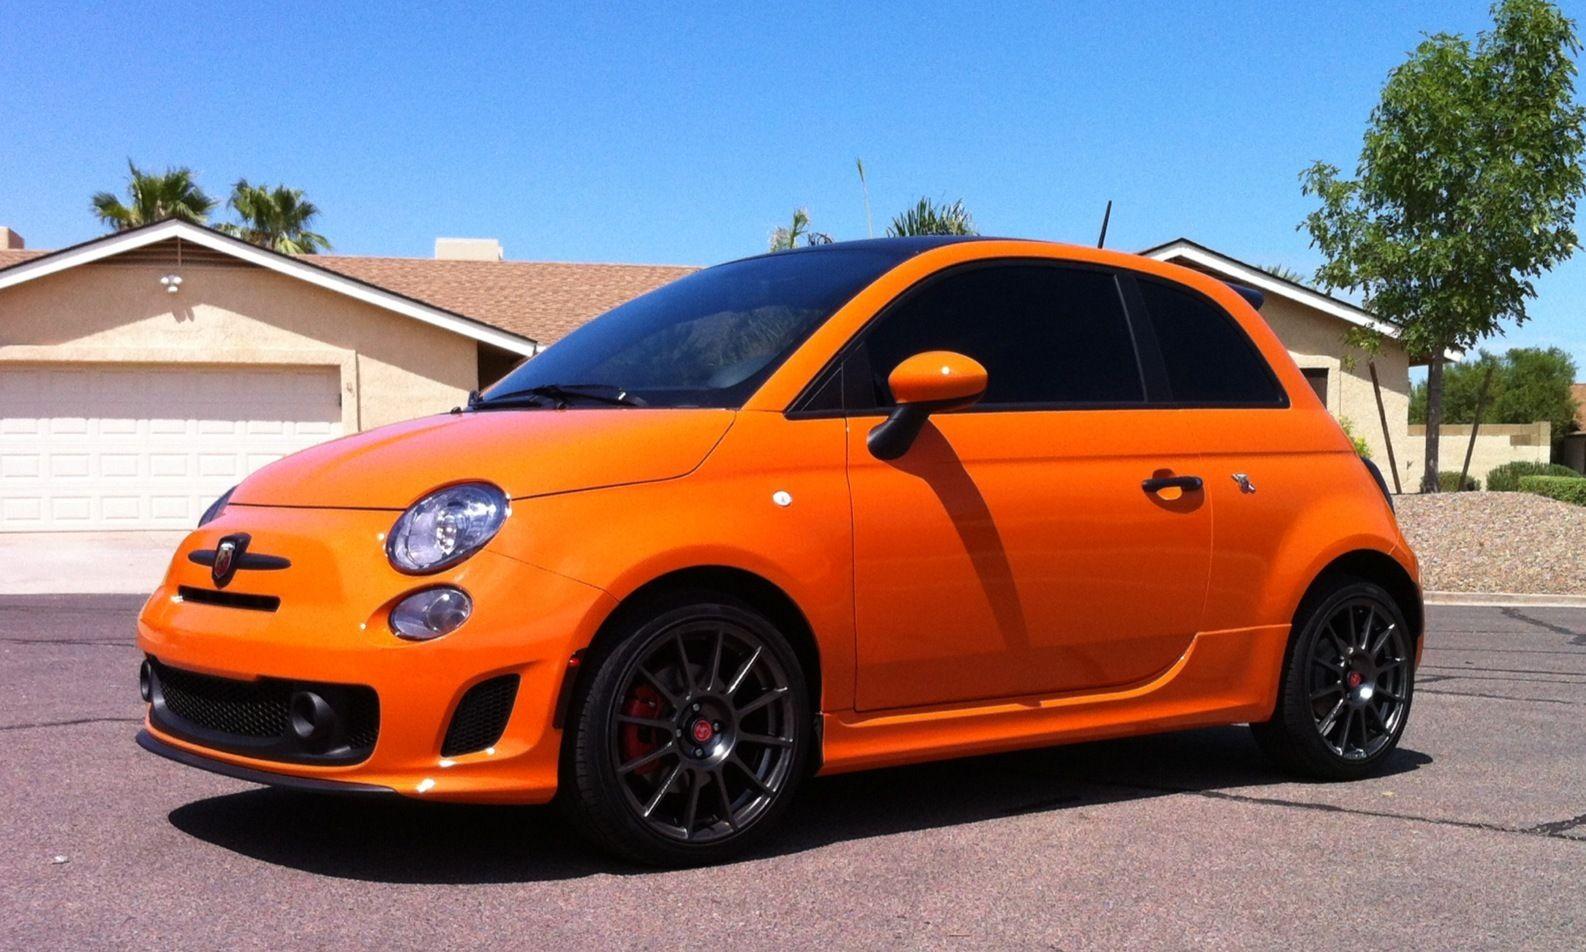 Super Fiat 500 Abarth in Orange - Great Colour! | Cars | Pinterest  AJ83